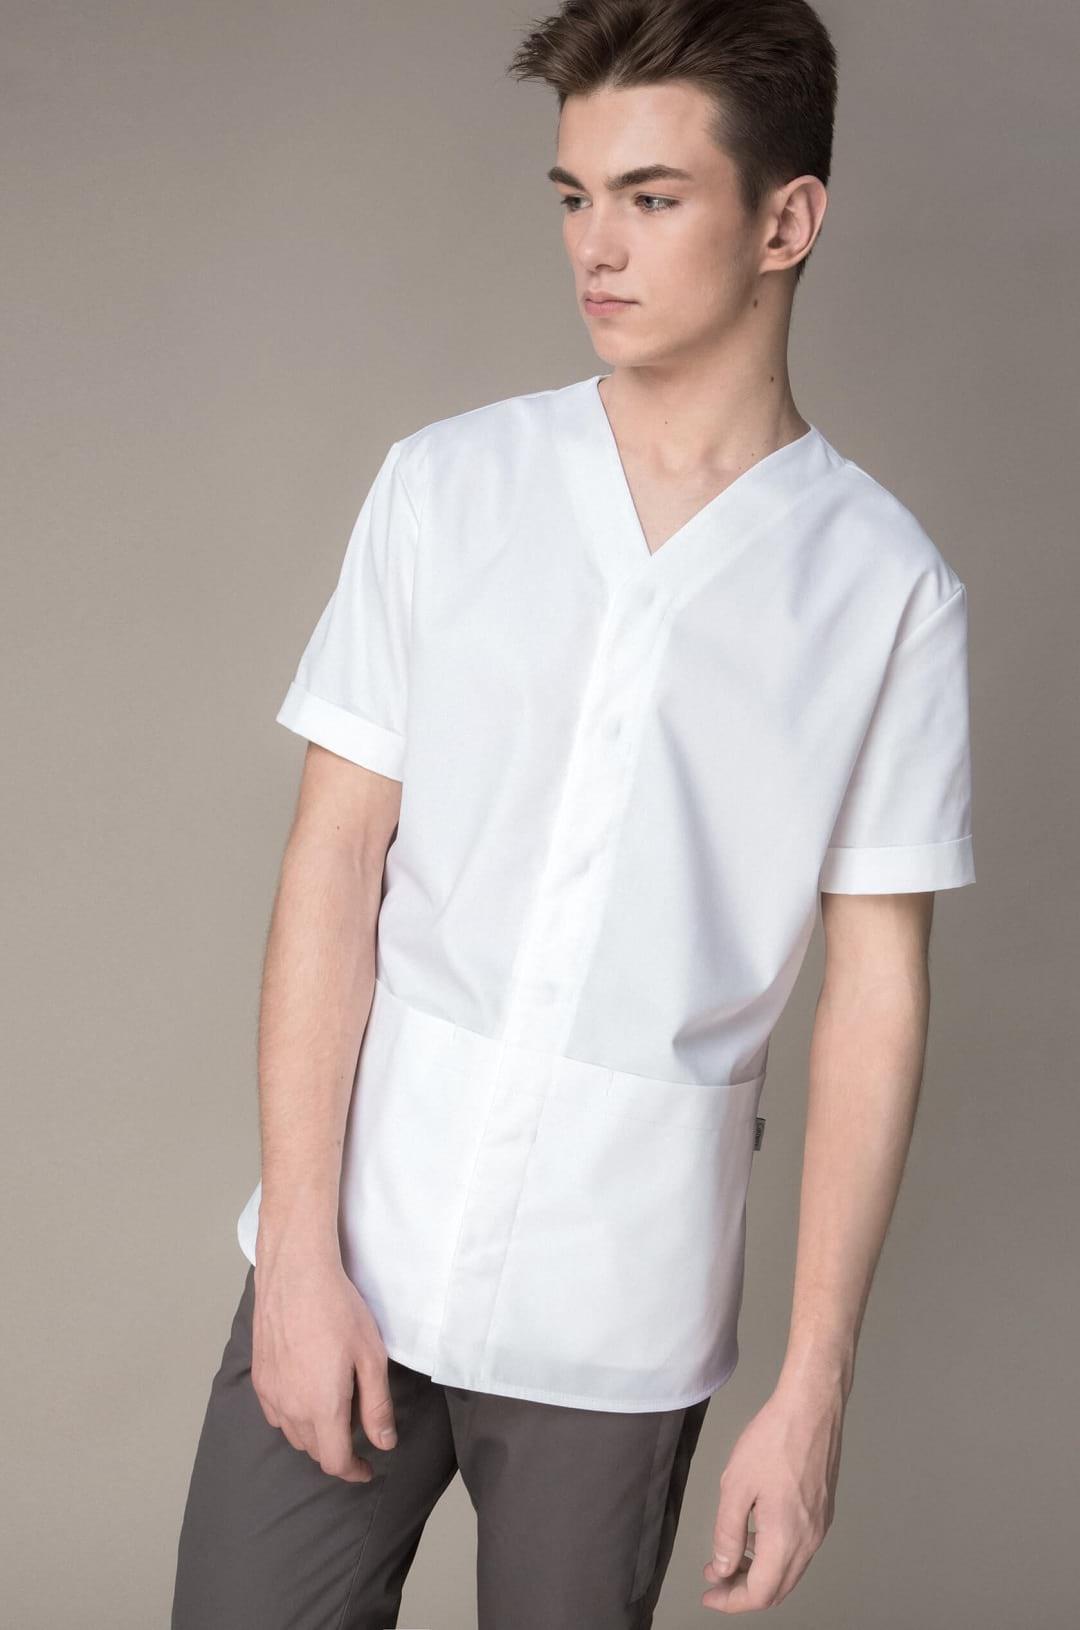 Блуза медицинская мужская 8-1028 (белый, экстрафлекс)